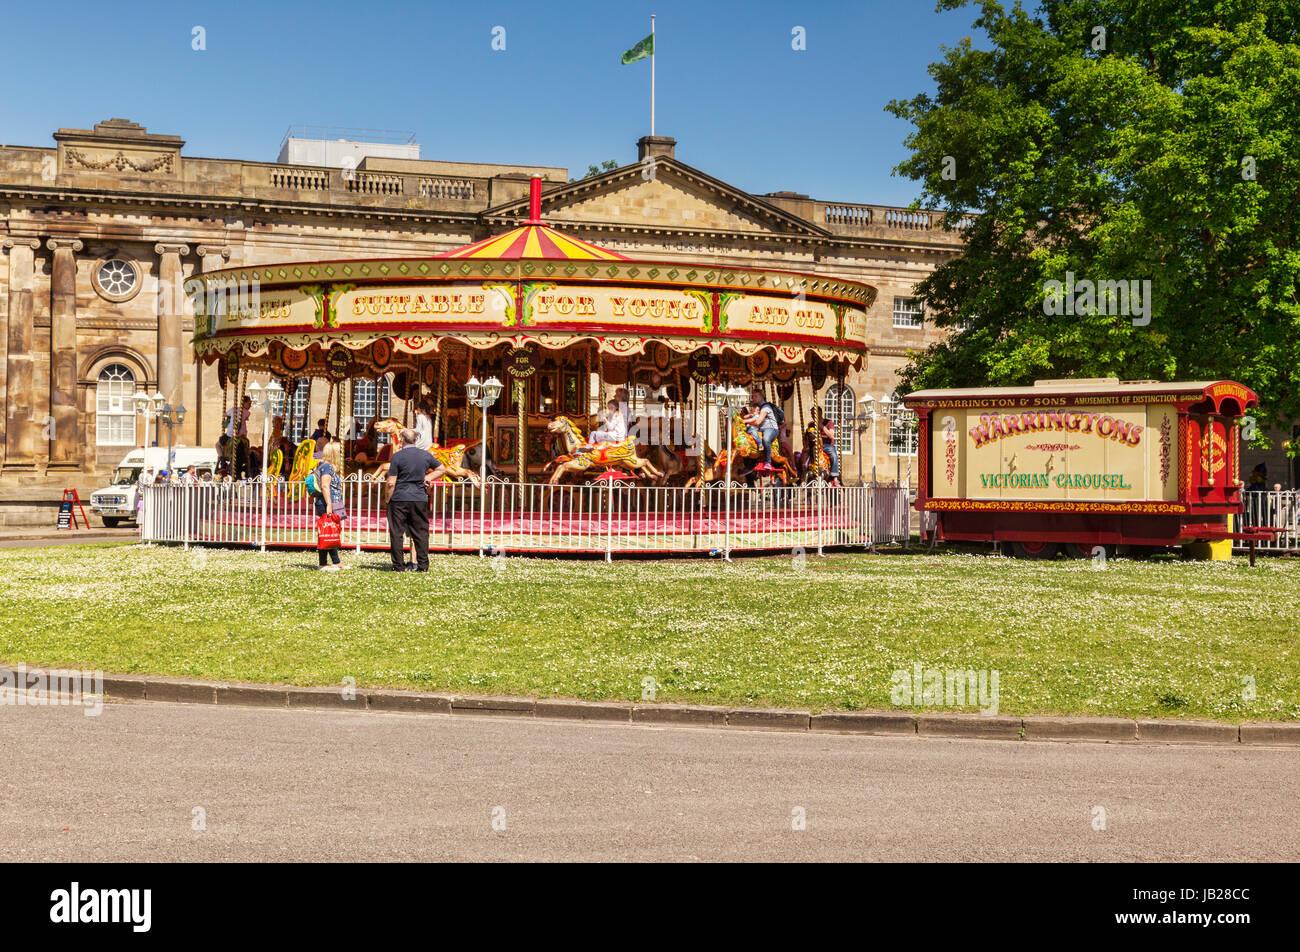 31 Mai 2017: York, North Yorkshire, Angleterre, Royaume-Uni - un carrousel victorien sur l'herbe, devant Photo Stock